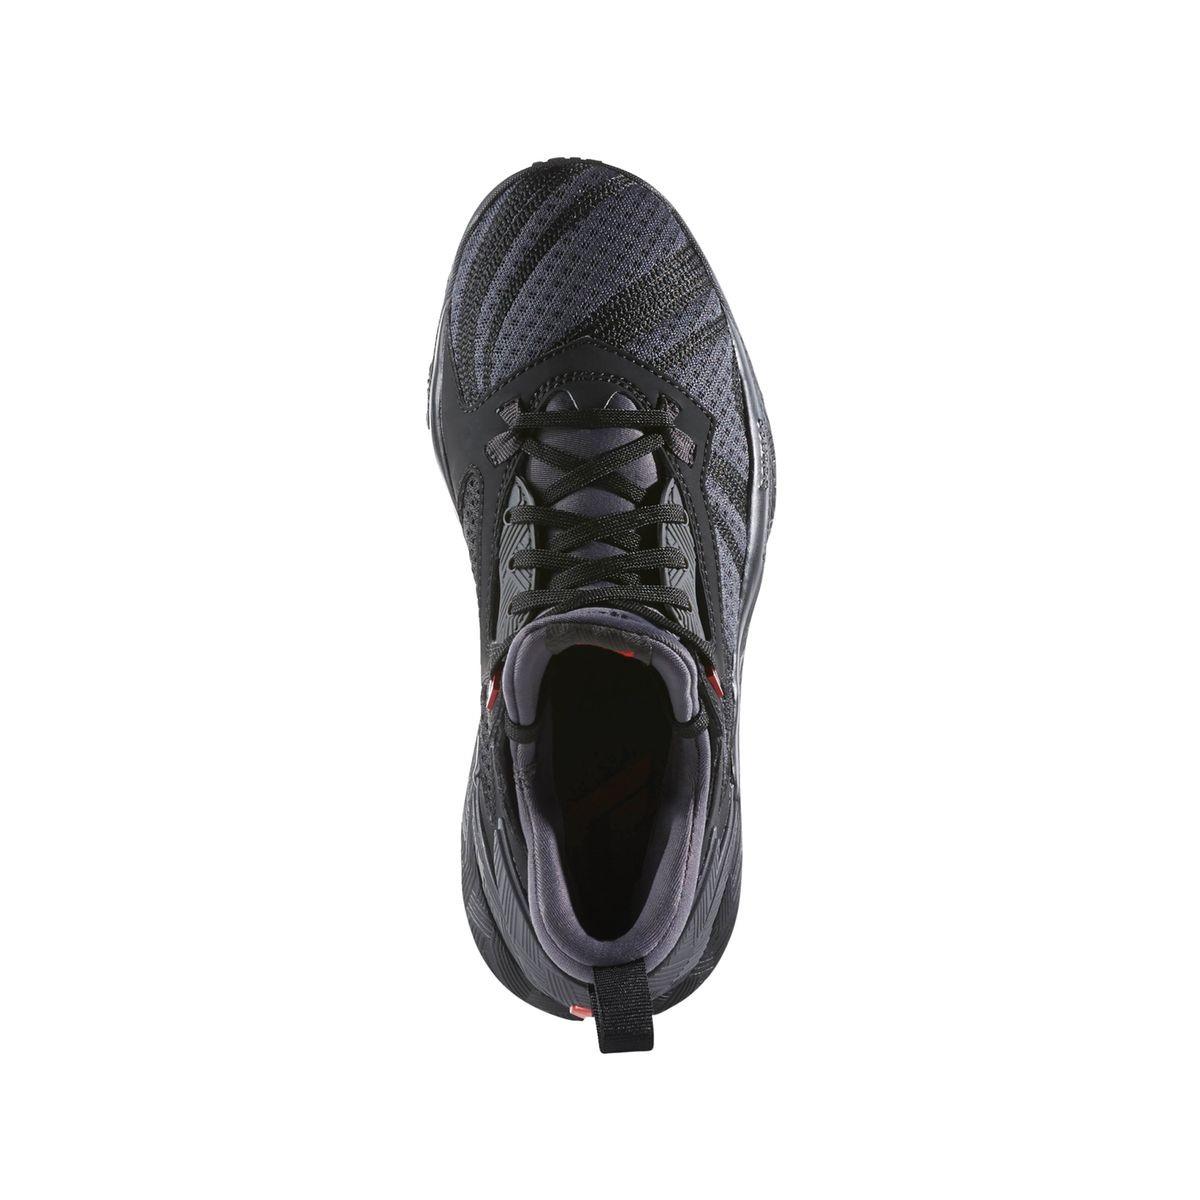 les chaussures bascet adidas garson